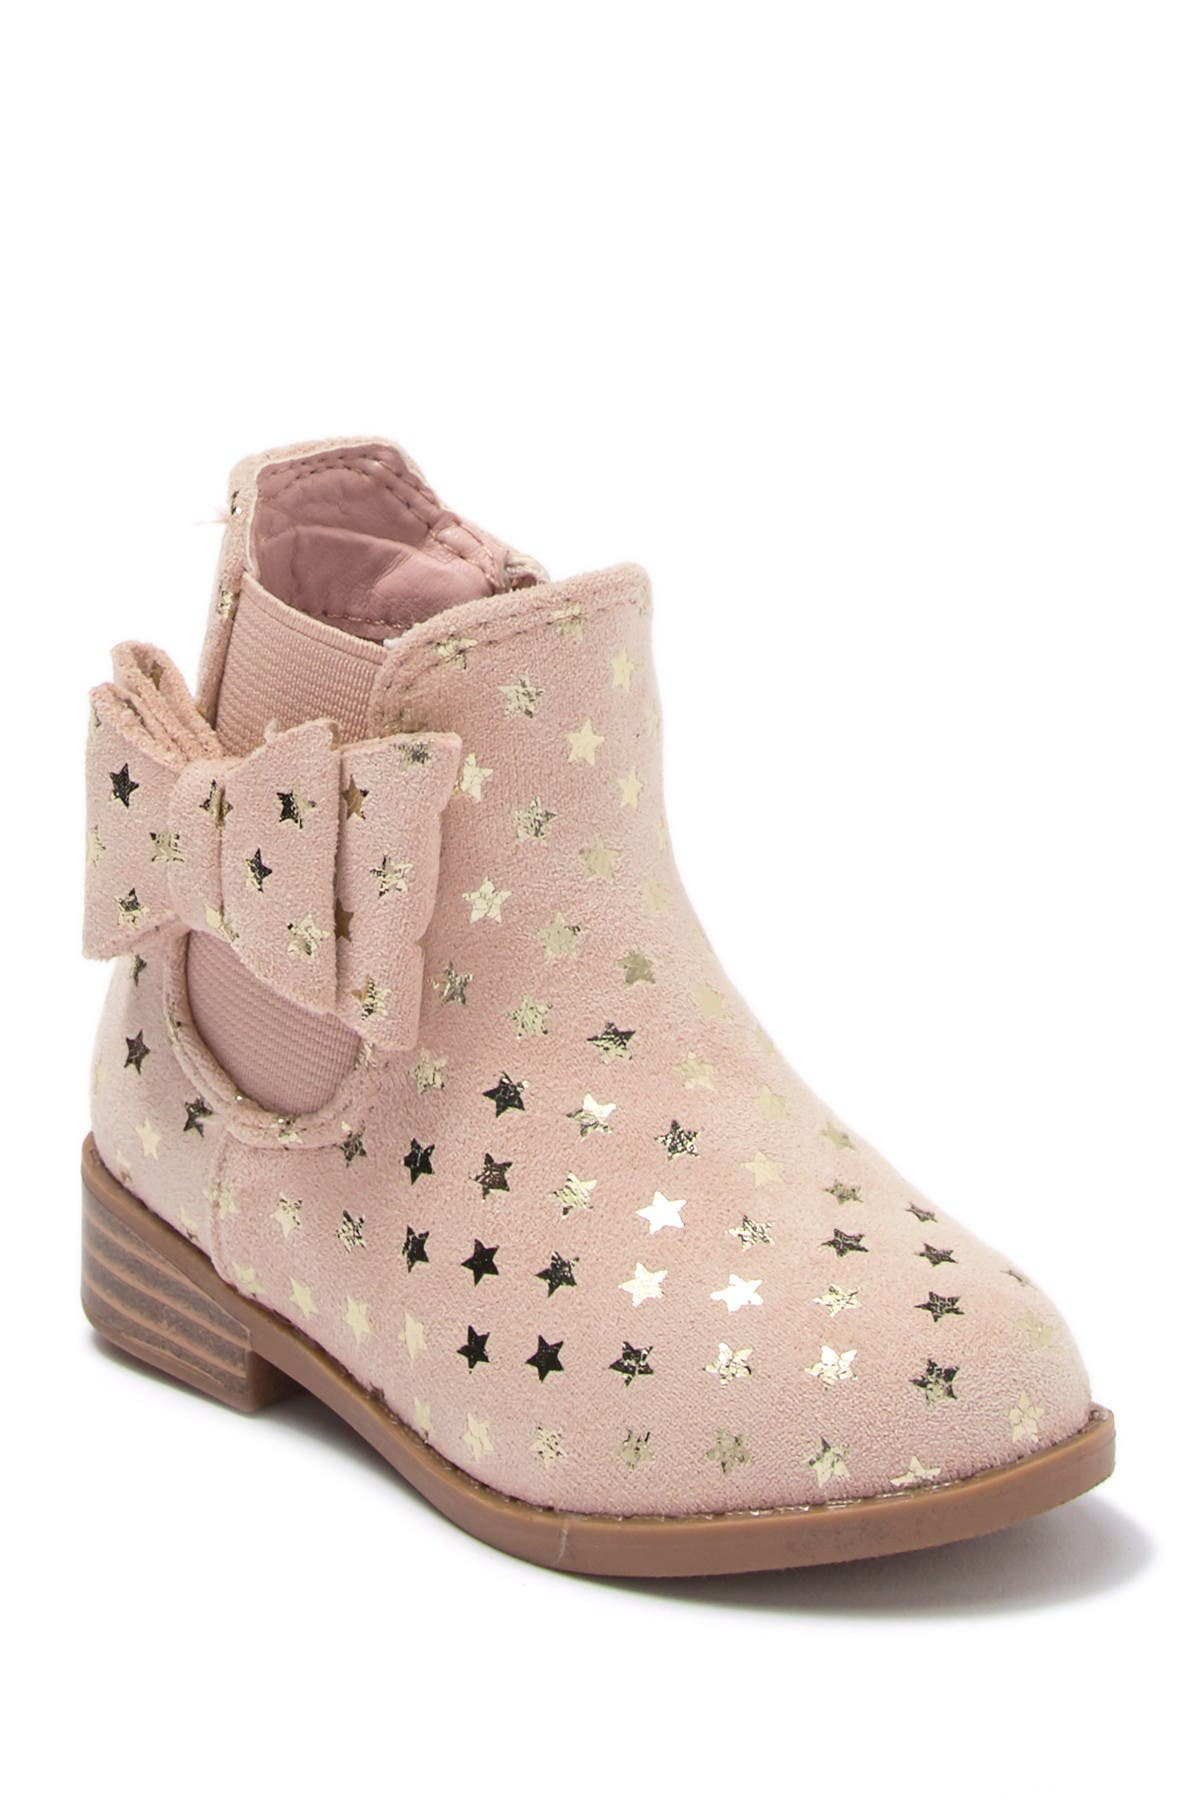 Tahari Kids' Girls' Shoes   Nordstrom Rack